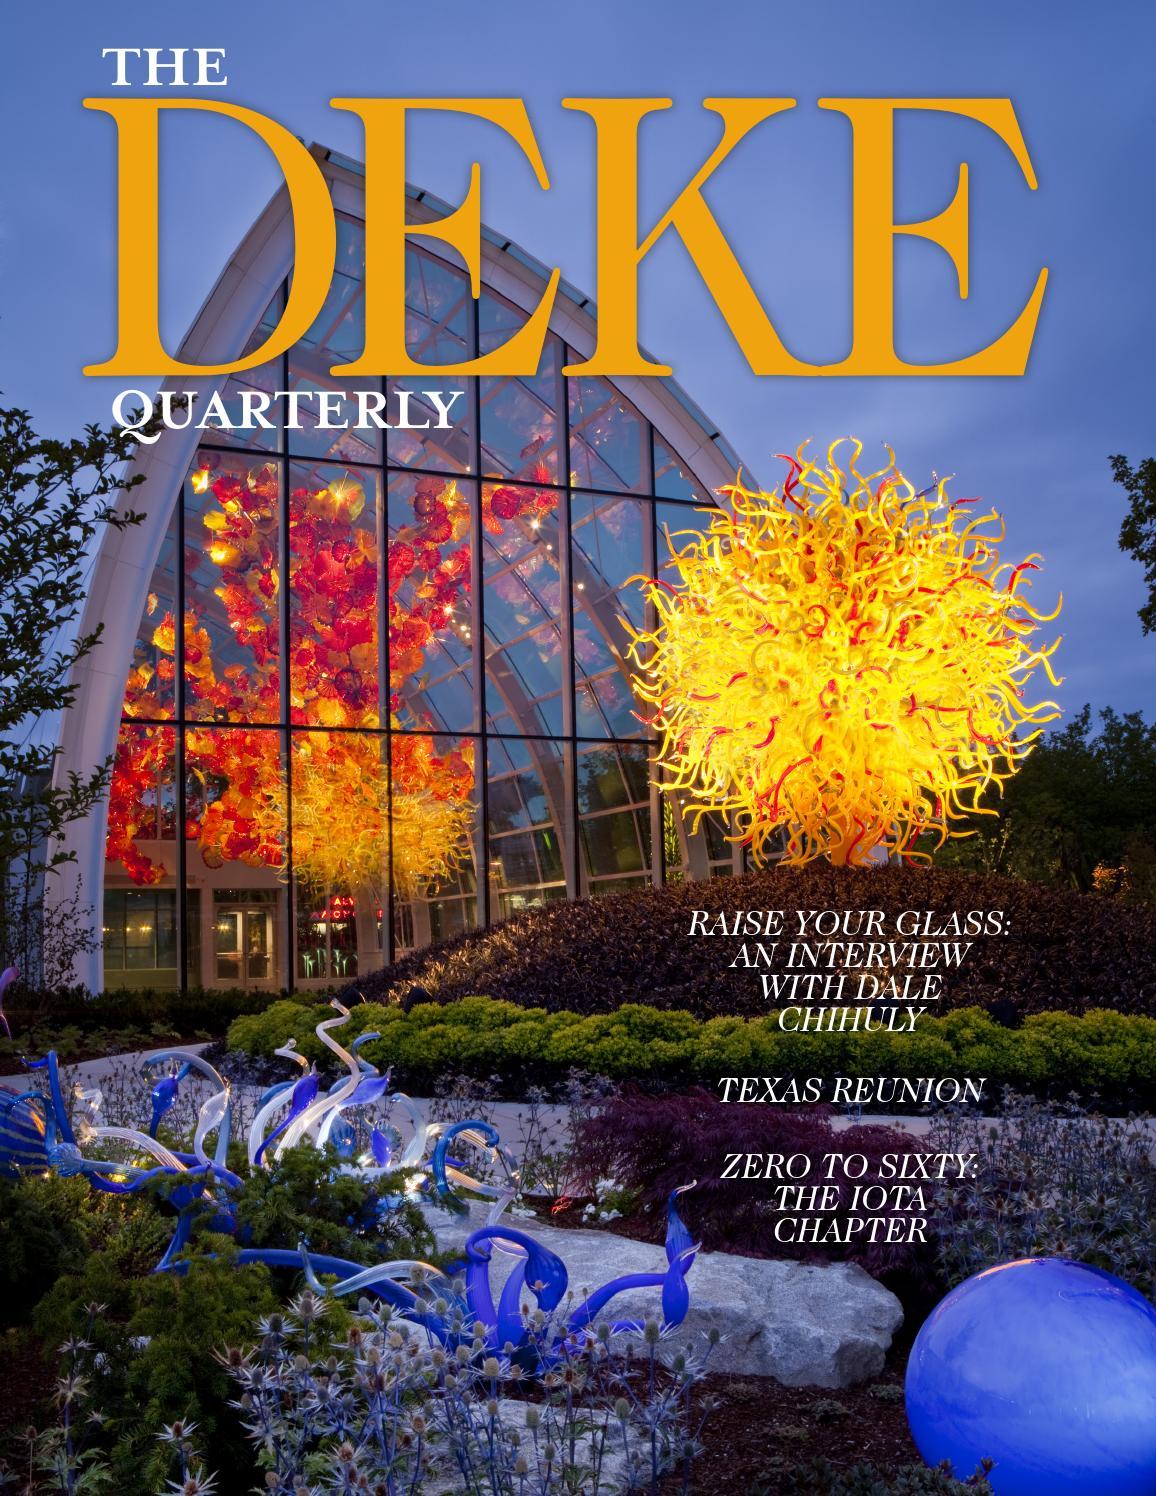 the deke quarterly volume 131 no 2 by delta kappa epsilon